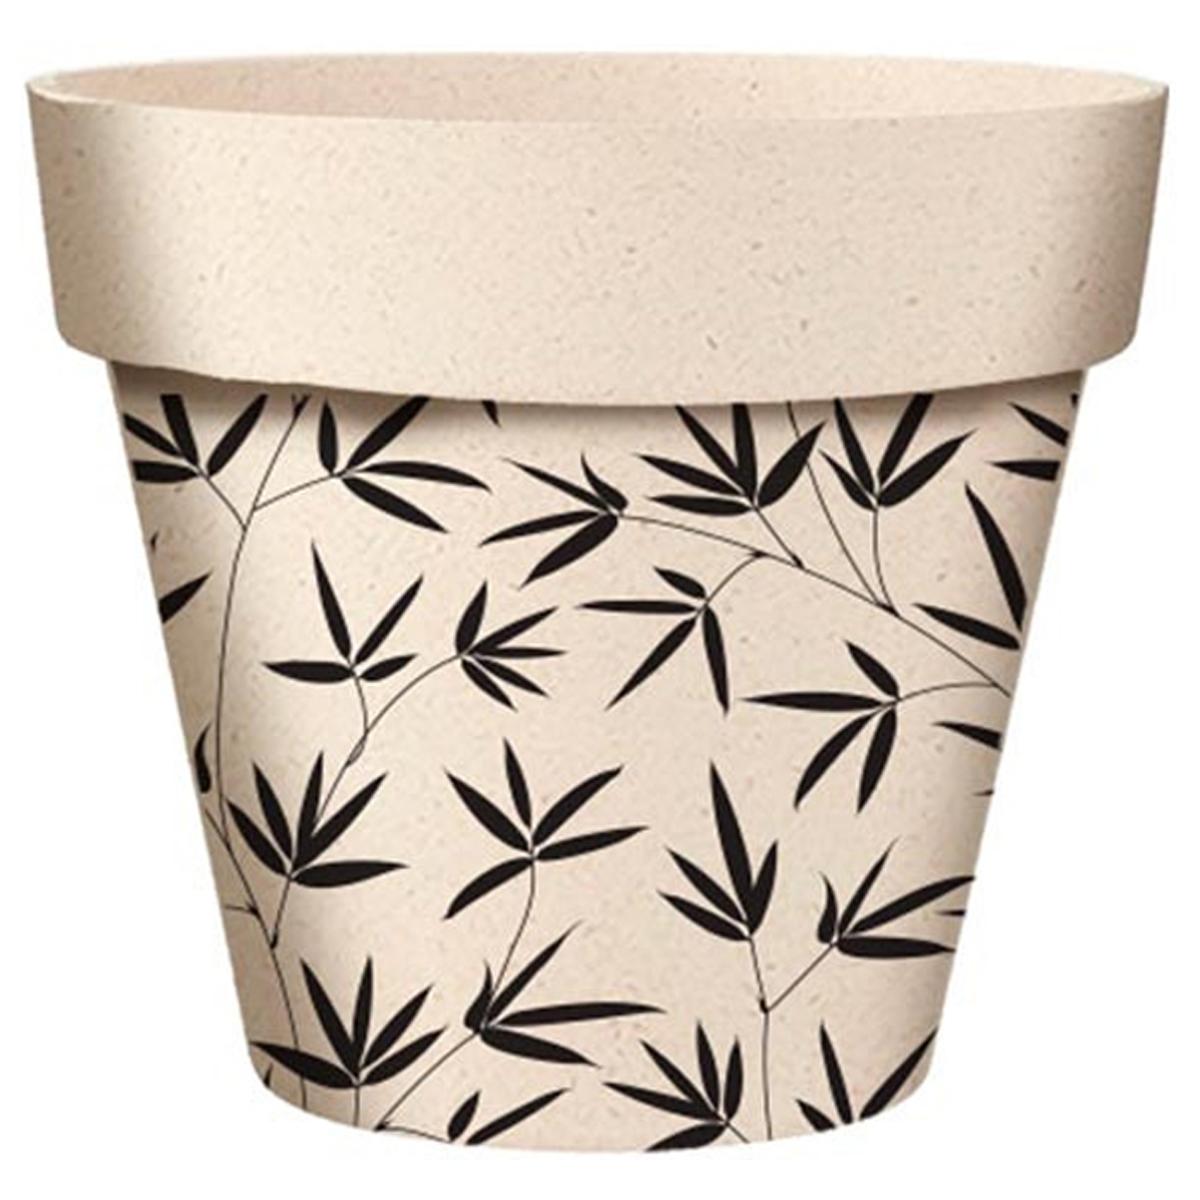 Cache-pot bambou \'Bambou\' noir beige -  14x12 cm - [A2068]